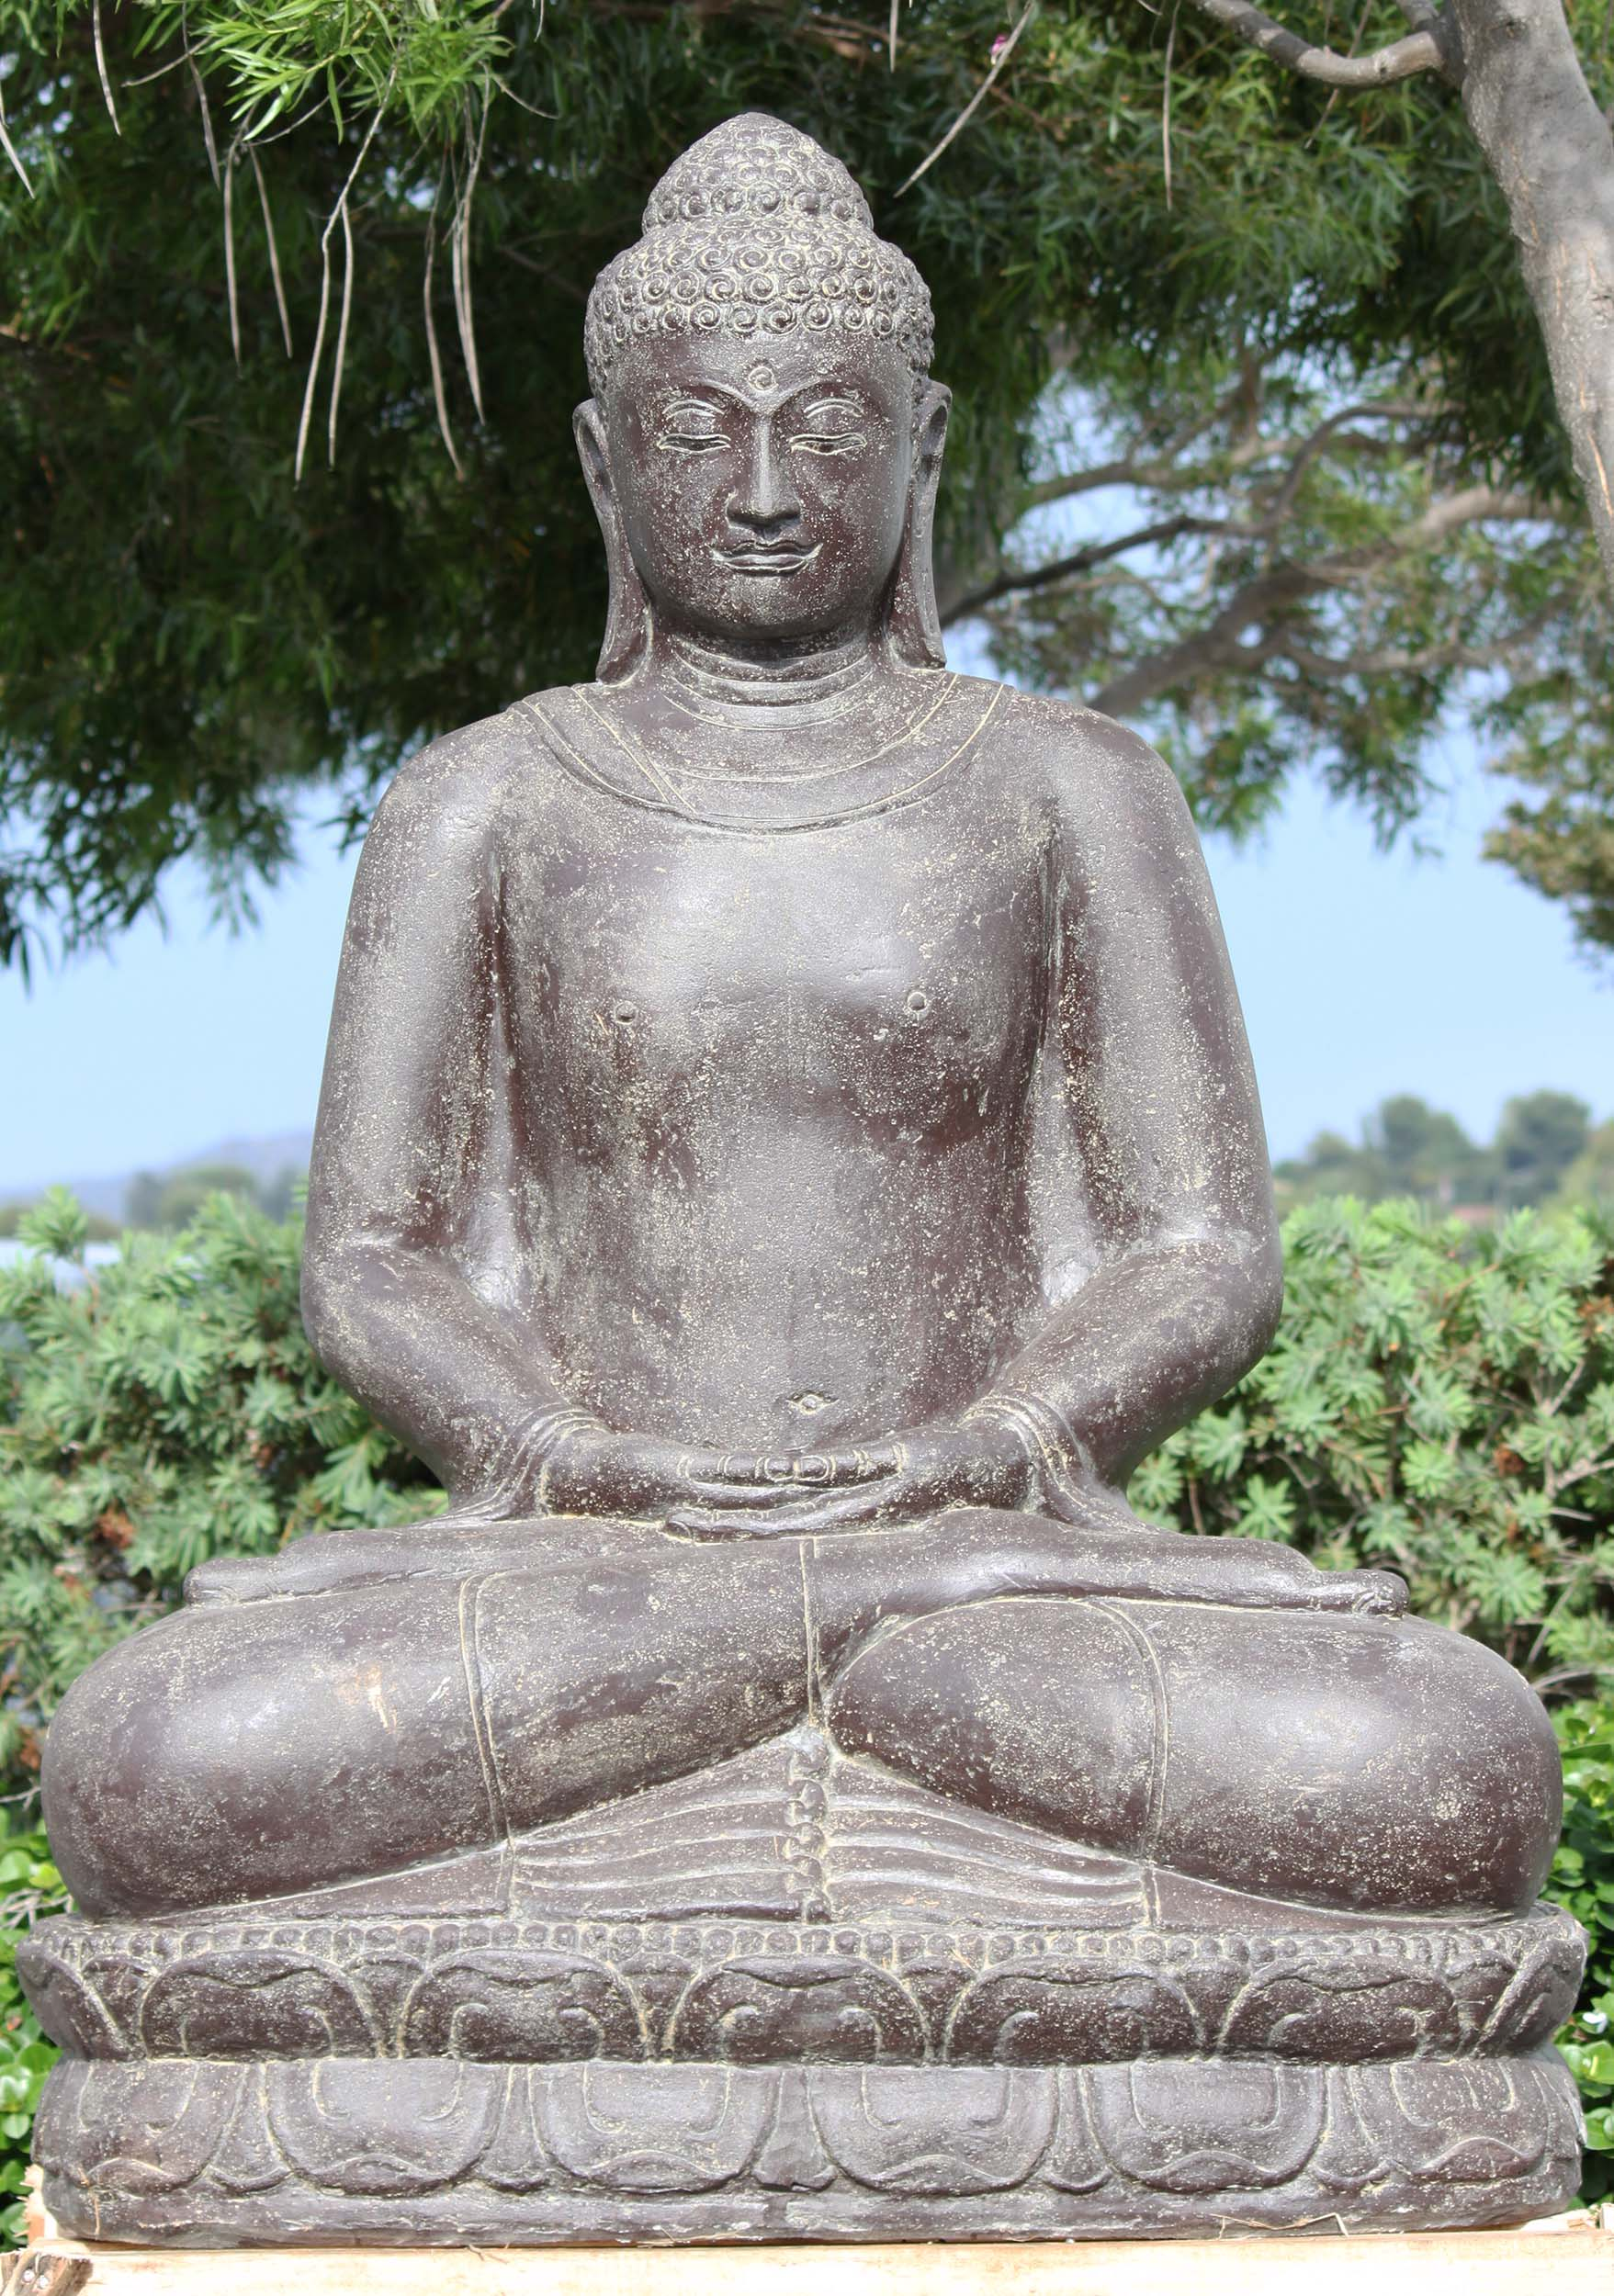 Large Meditating Buddha Garden Statue 59 116ls633 Hindu Gods Buddha Statues